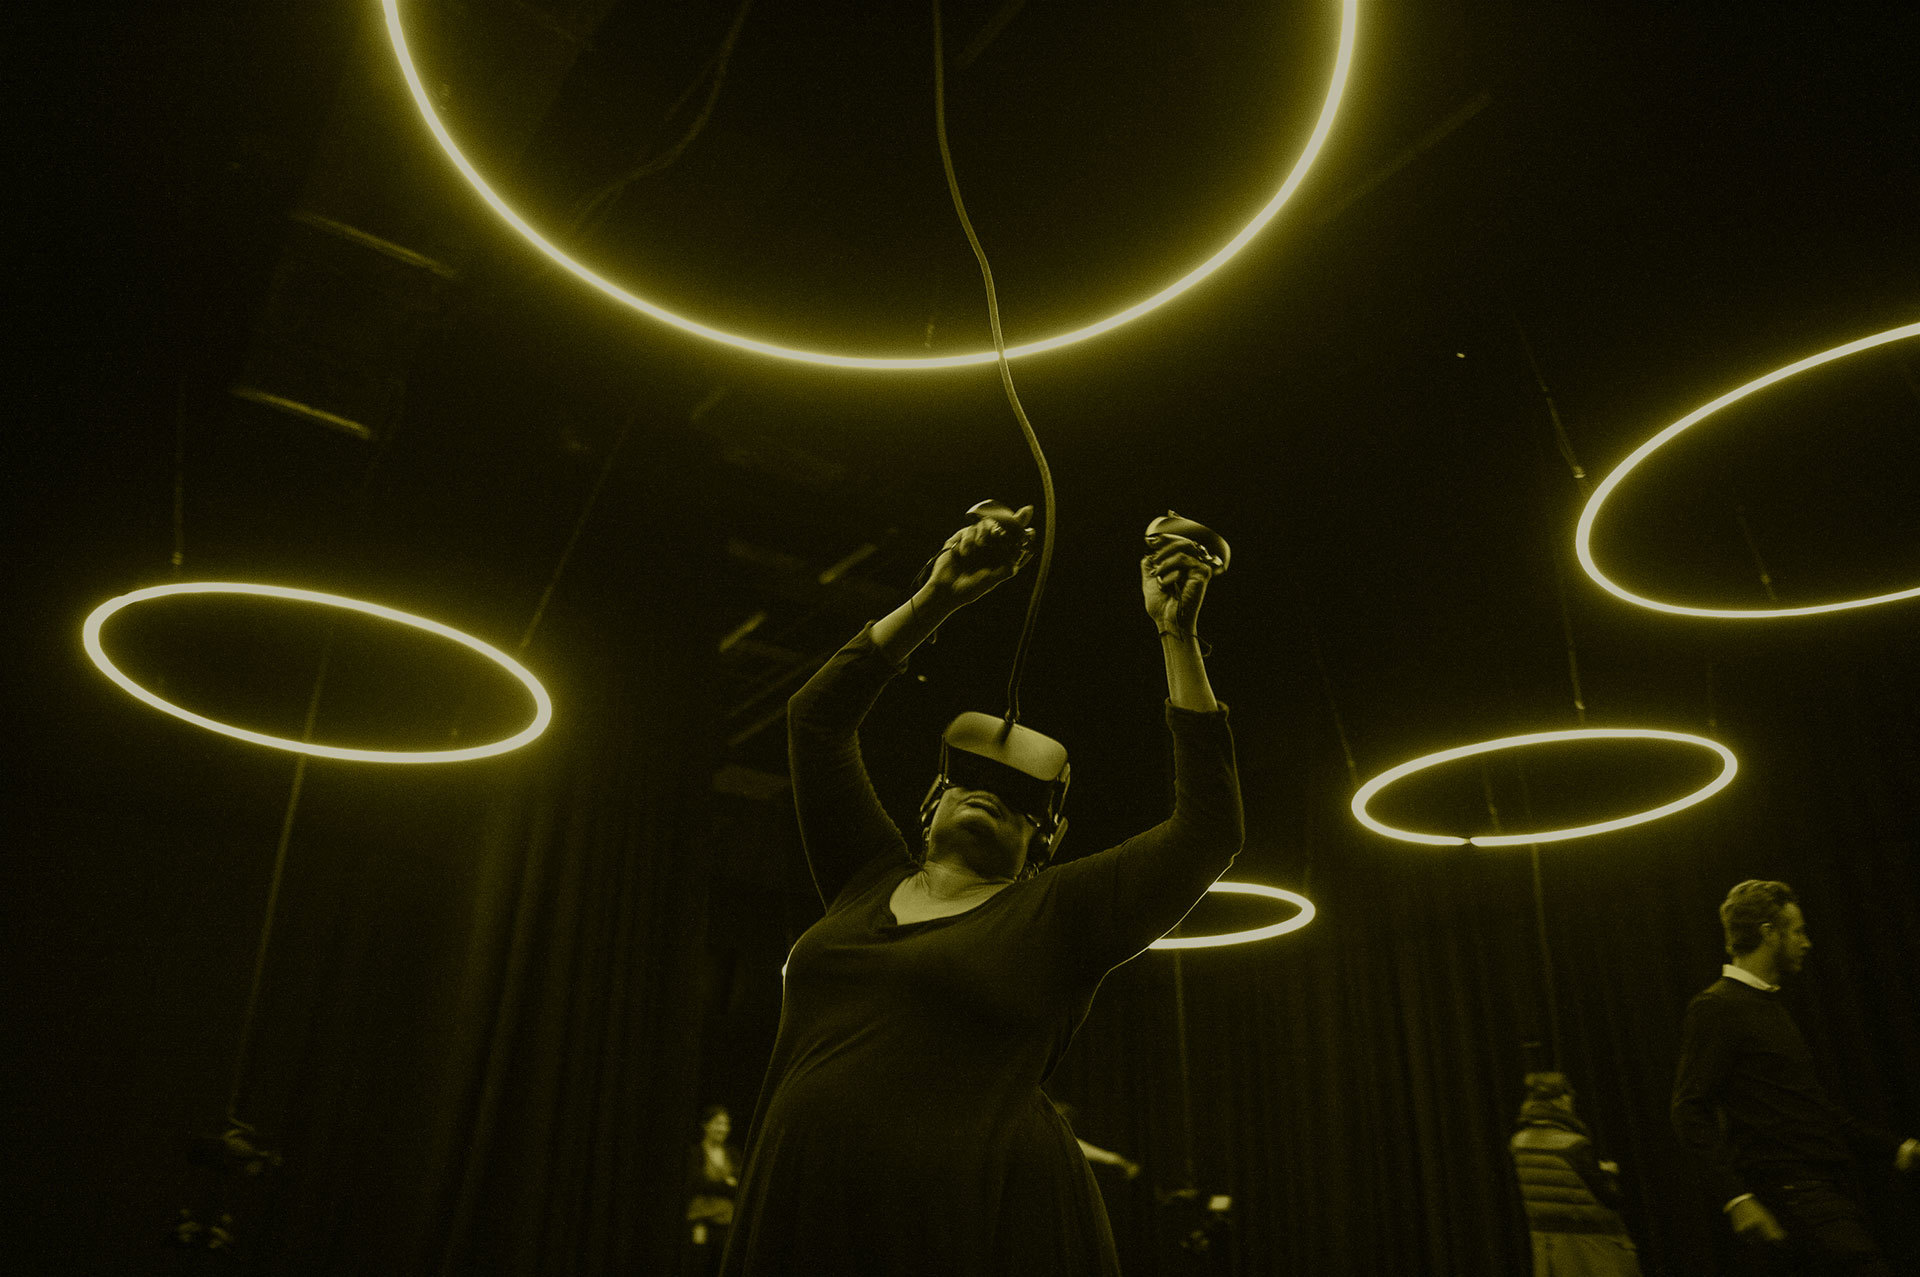 Spheres Installation, Rockefeller Center, Credit:  Kat Harris